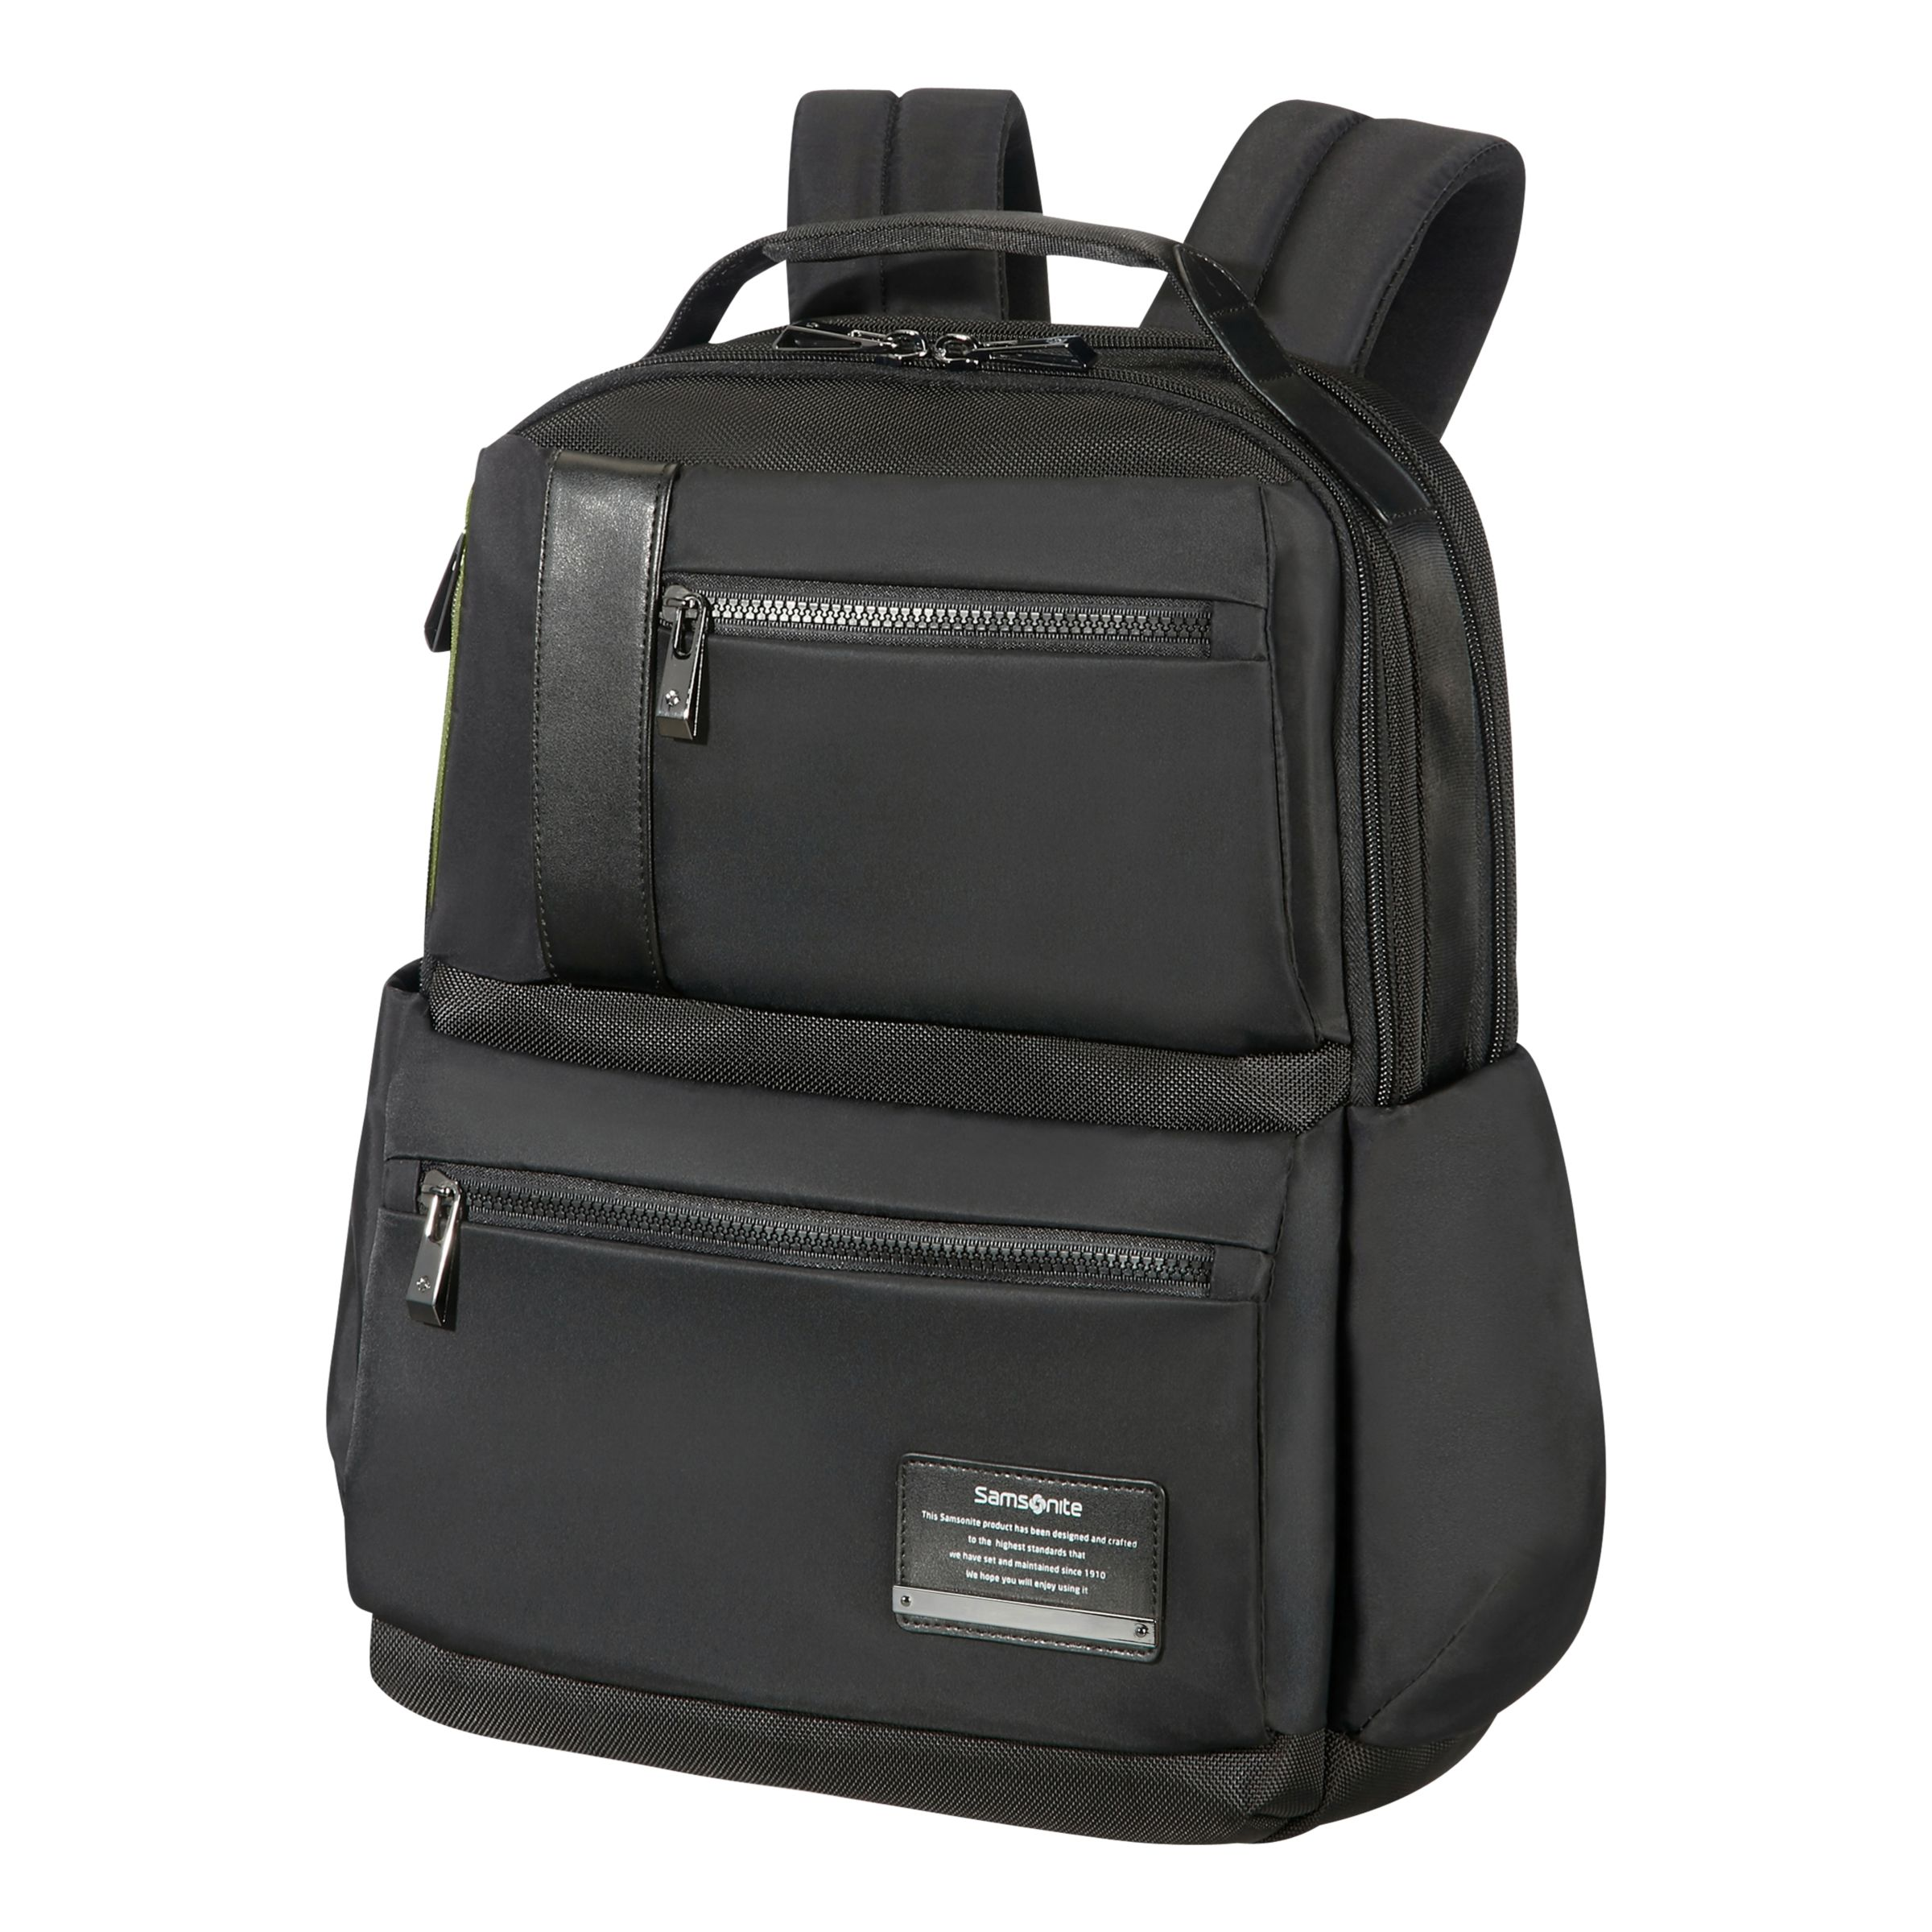 Samsonite Samsonite OpenRoad Laptop Backpack 15.6, Black